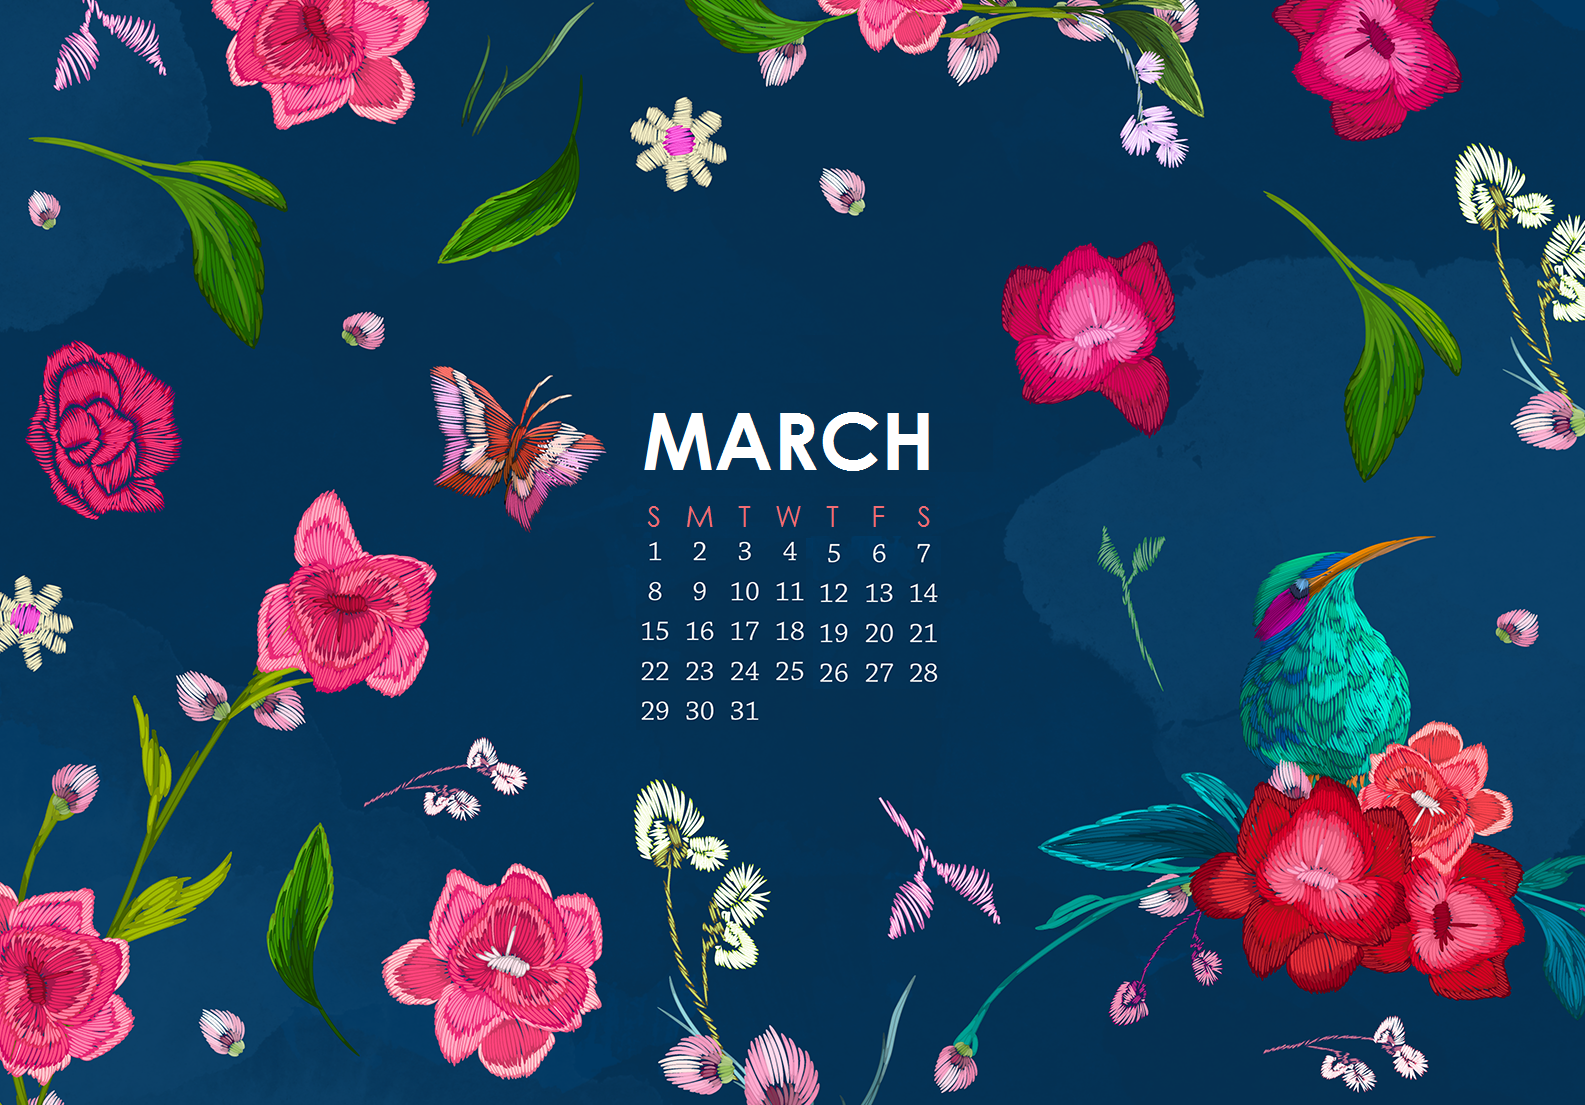 March 2020 Desktop Wallpaper In 2020 Desktop Wallpaper Calendar Desktop Wallpaper Calendar Design